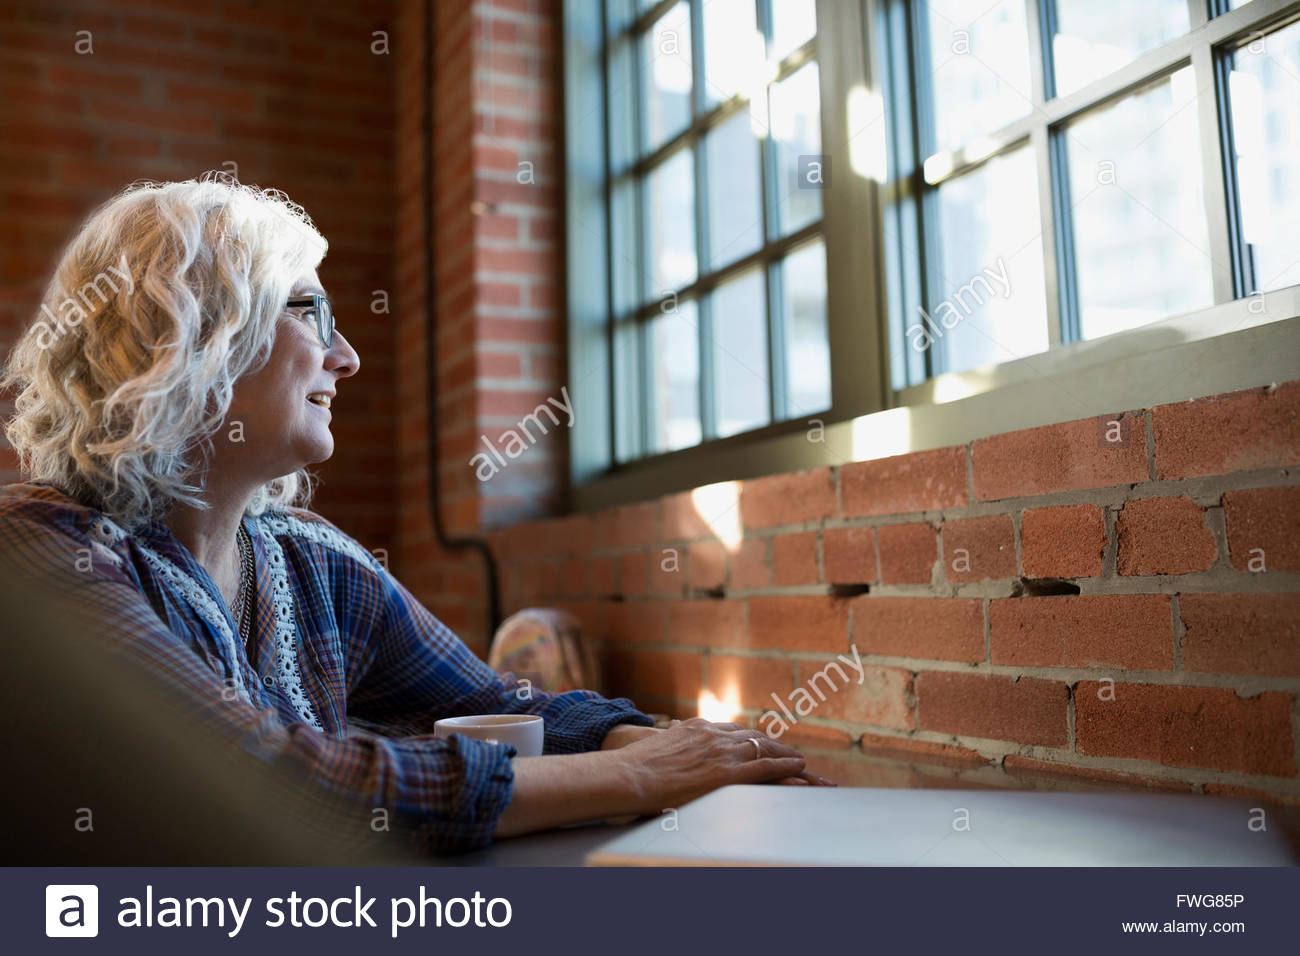 Nachdenkliche Frau trinkt Kaffee in Coffee-shop Stockbild